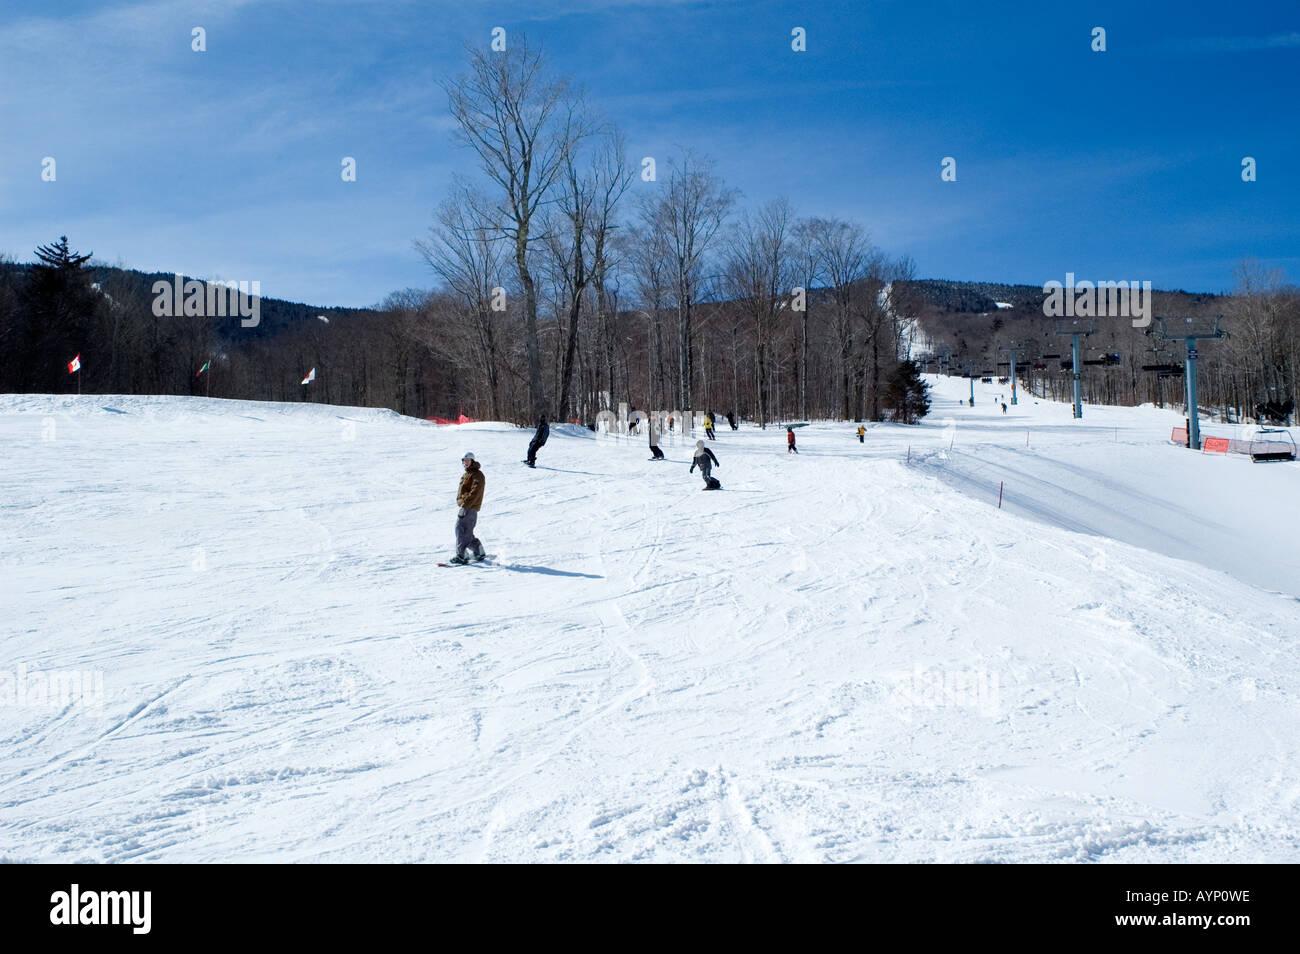 killington ski resort vermont usa stock photo: 9802397 - alamy